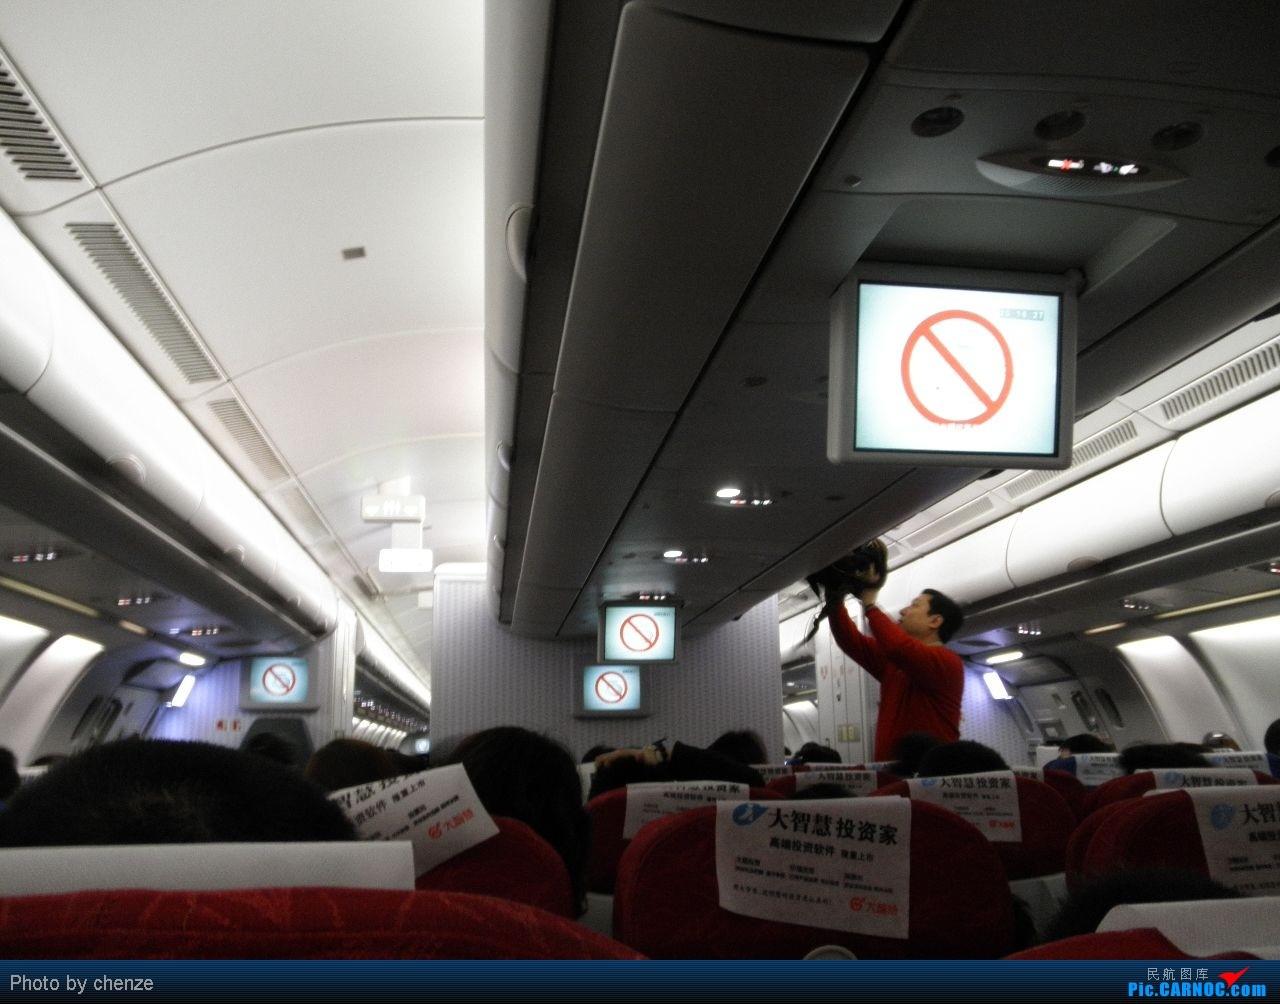 Re:[原创]春节回家探亲,奉上些烂图,笑纳!!PVG-SHE-PVG AIRBUS A330-300 B-6128 中国沈阳桃仙机场